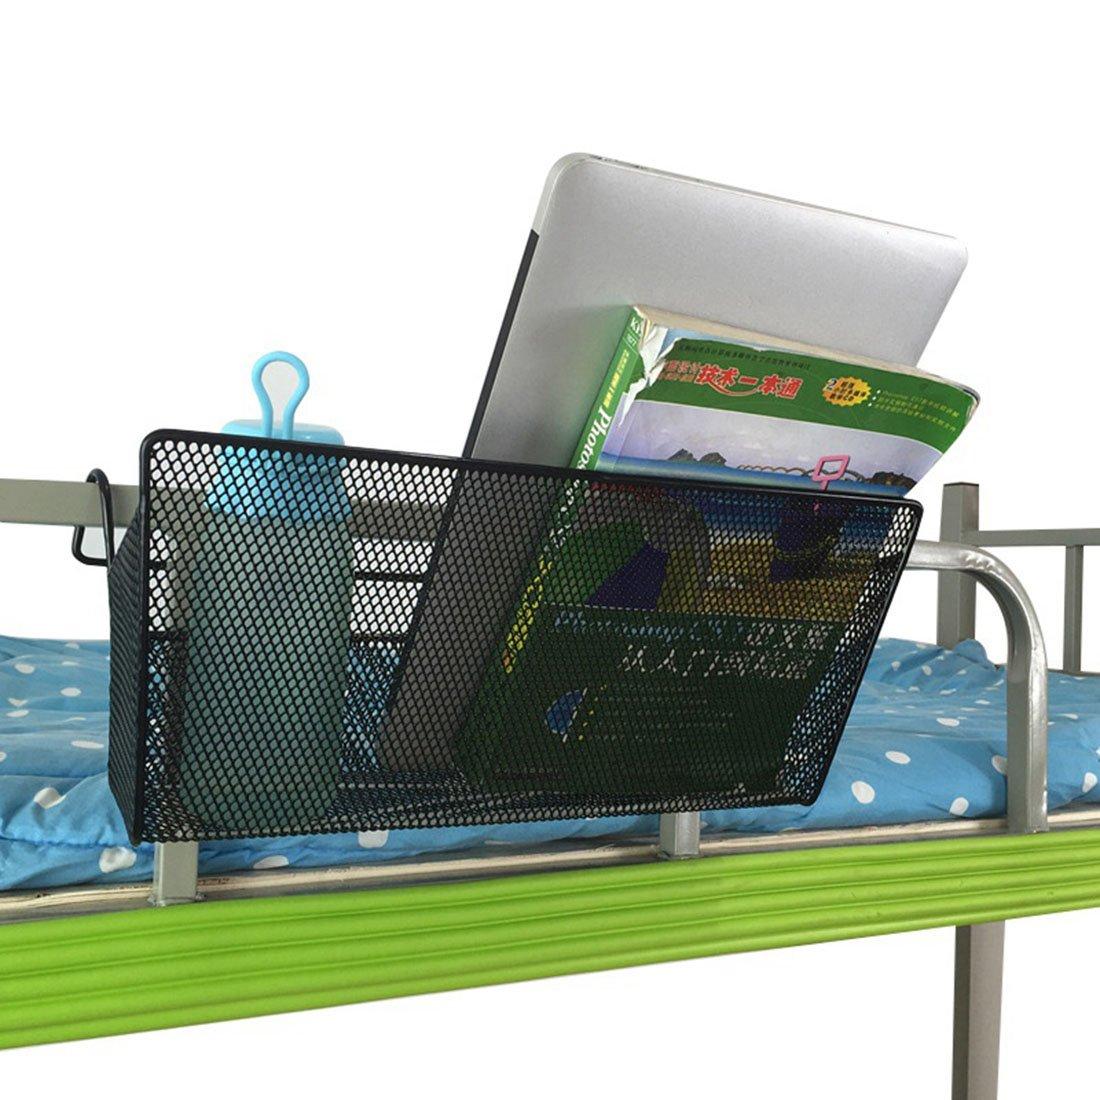 YUENA CARE Dormitory Bedside Storage Baskets Mesh Origanizer Caddy Table Hanging Organizer Black